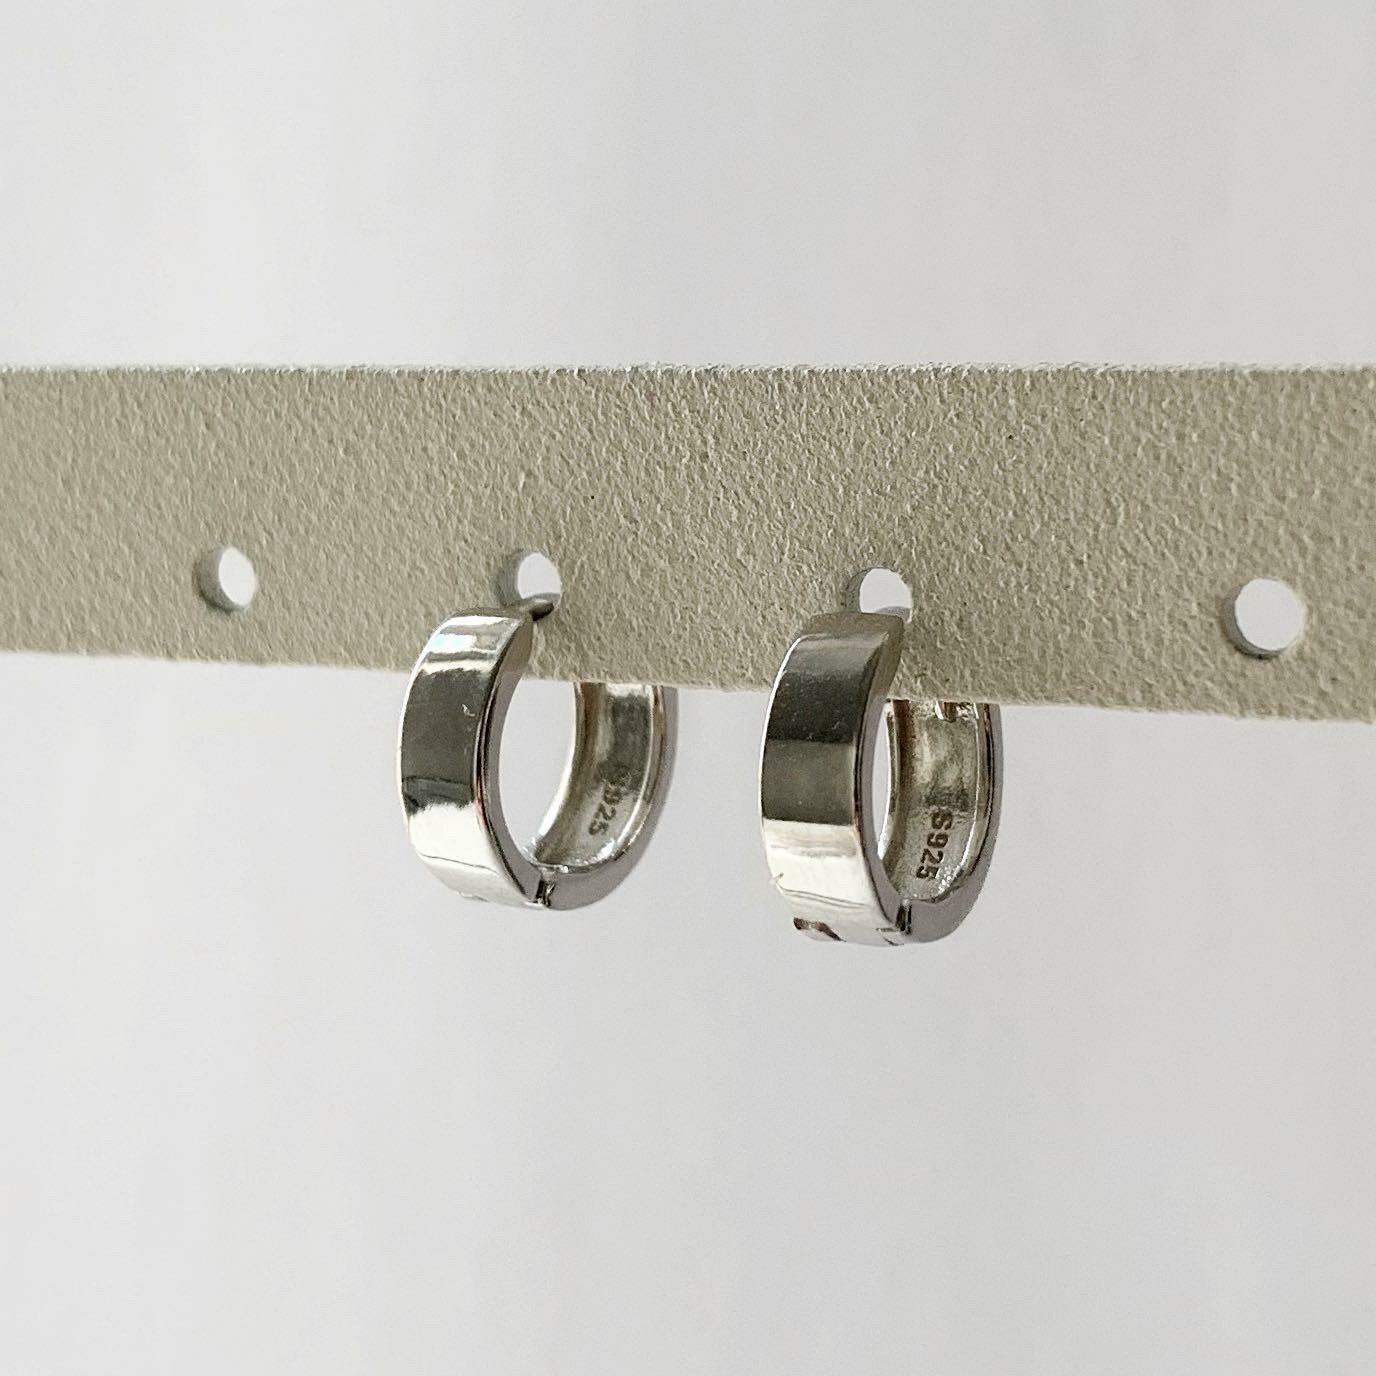 Slippery oorringetjes 925 sterling zilver 10 mm